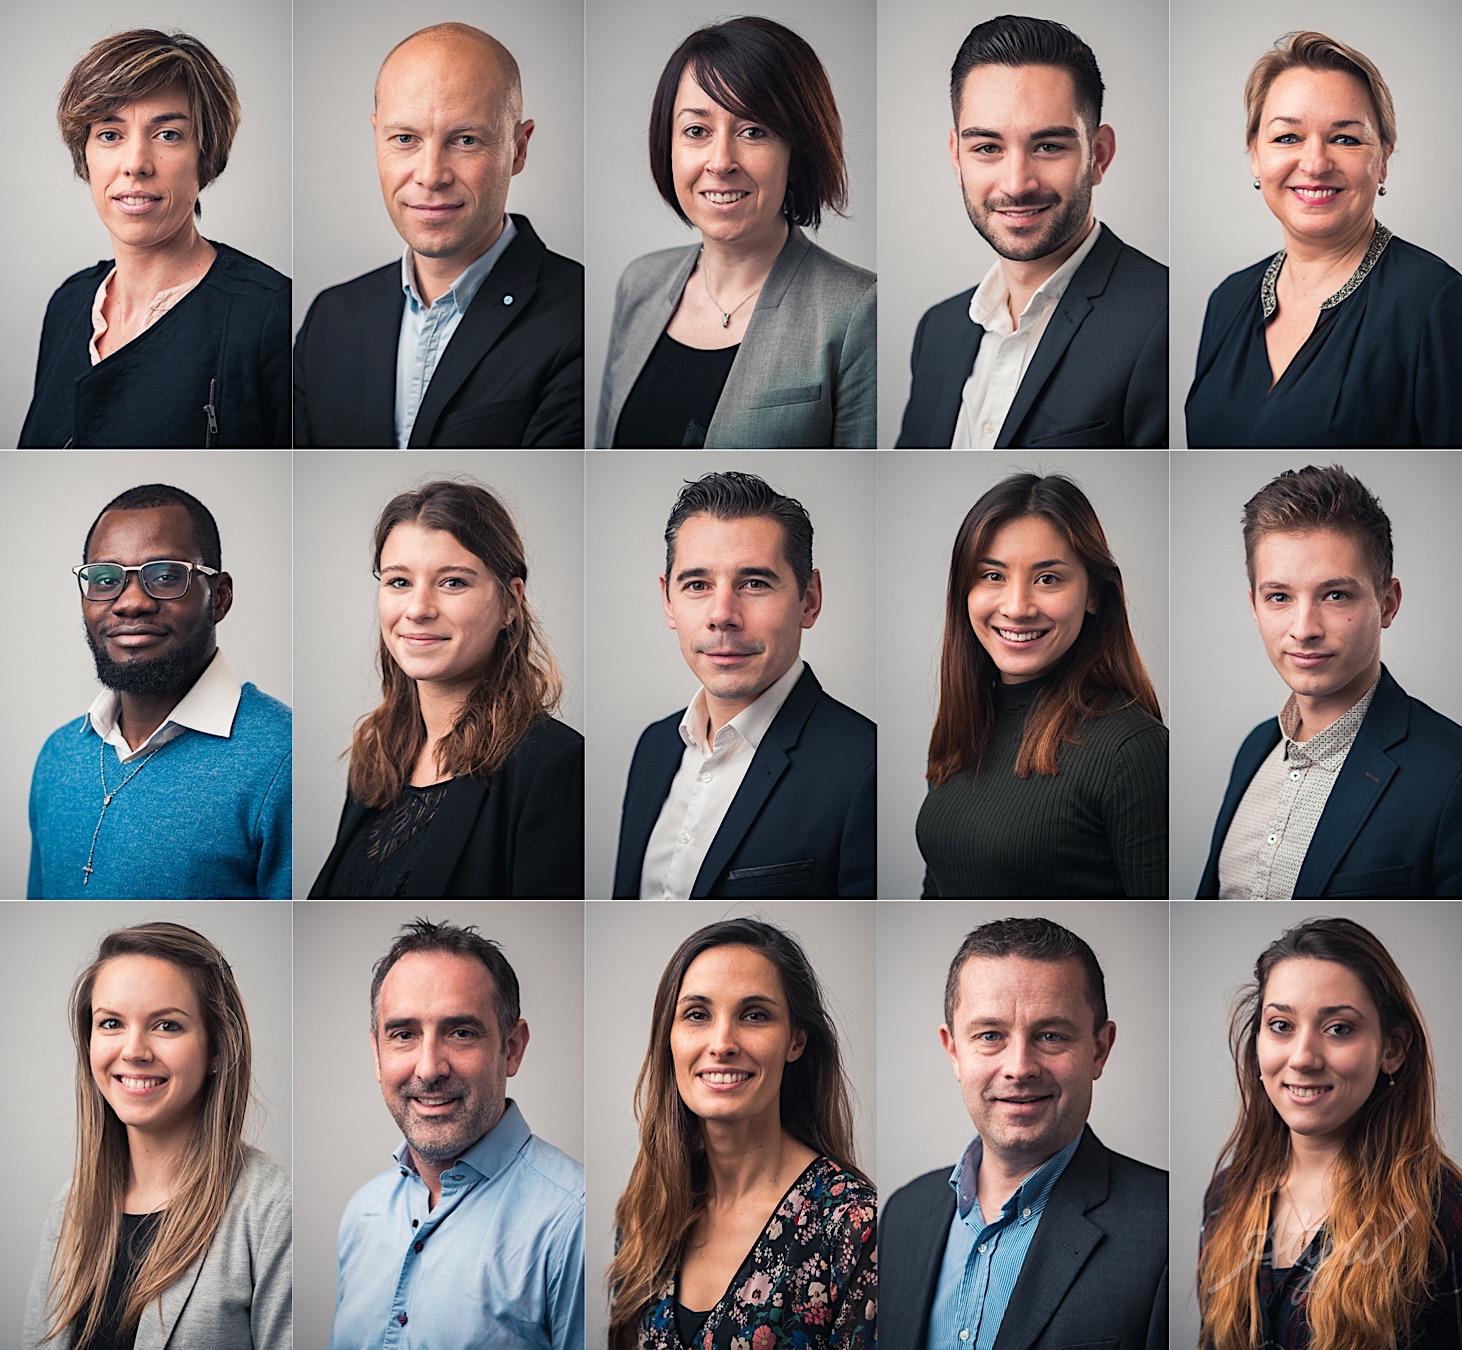 photographe portrait corporate